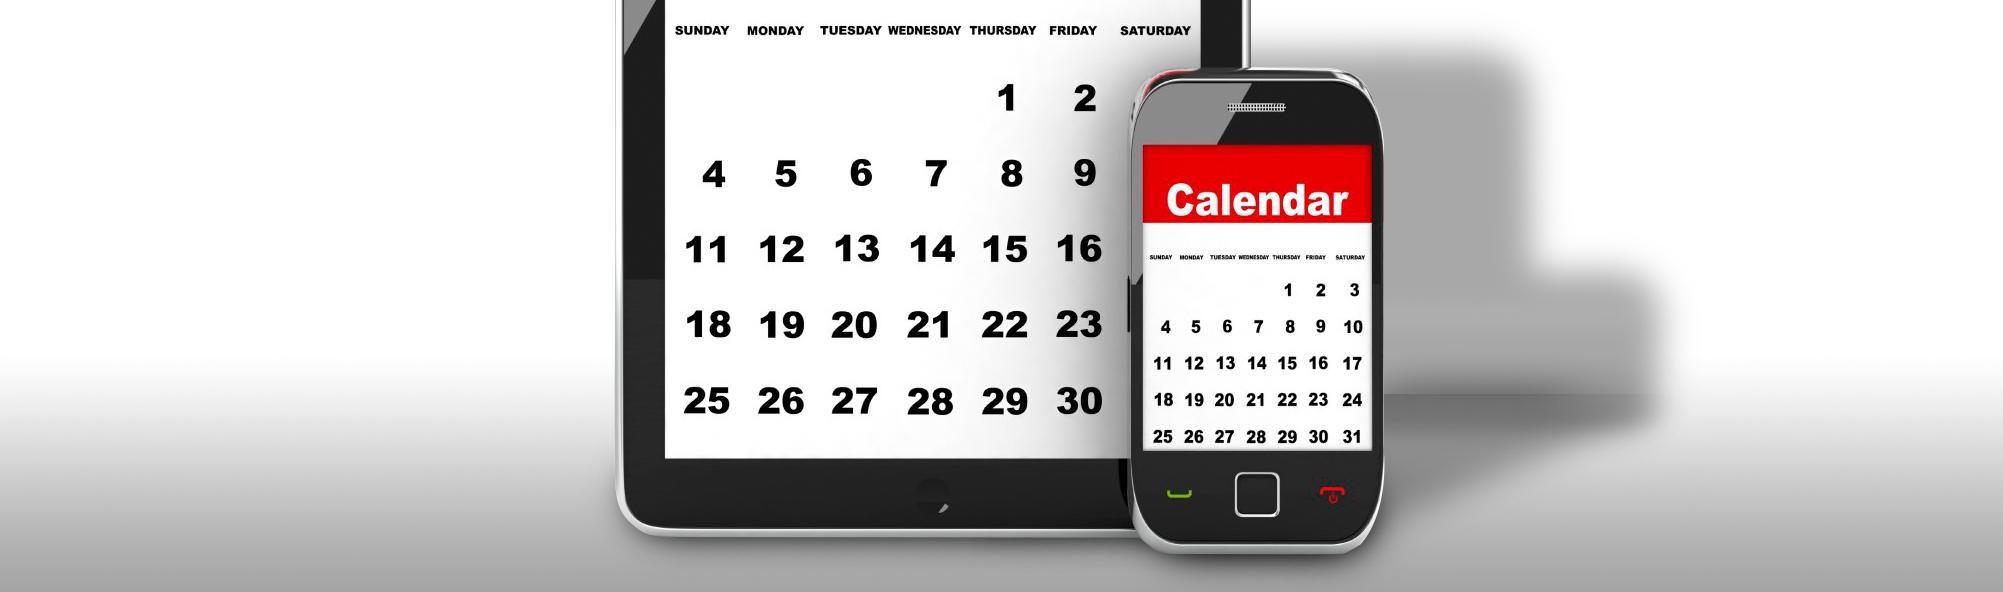 Kalender_V3